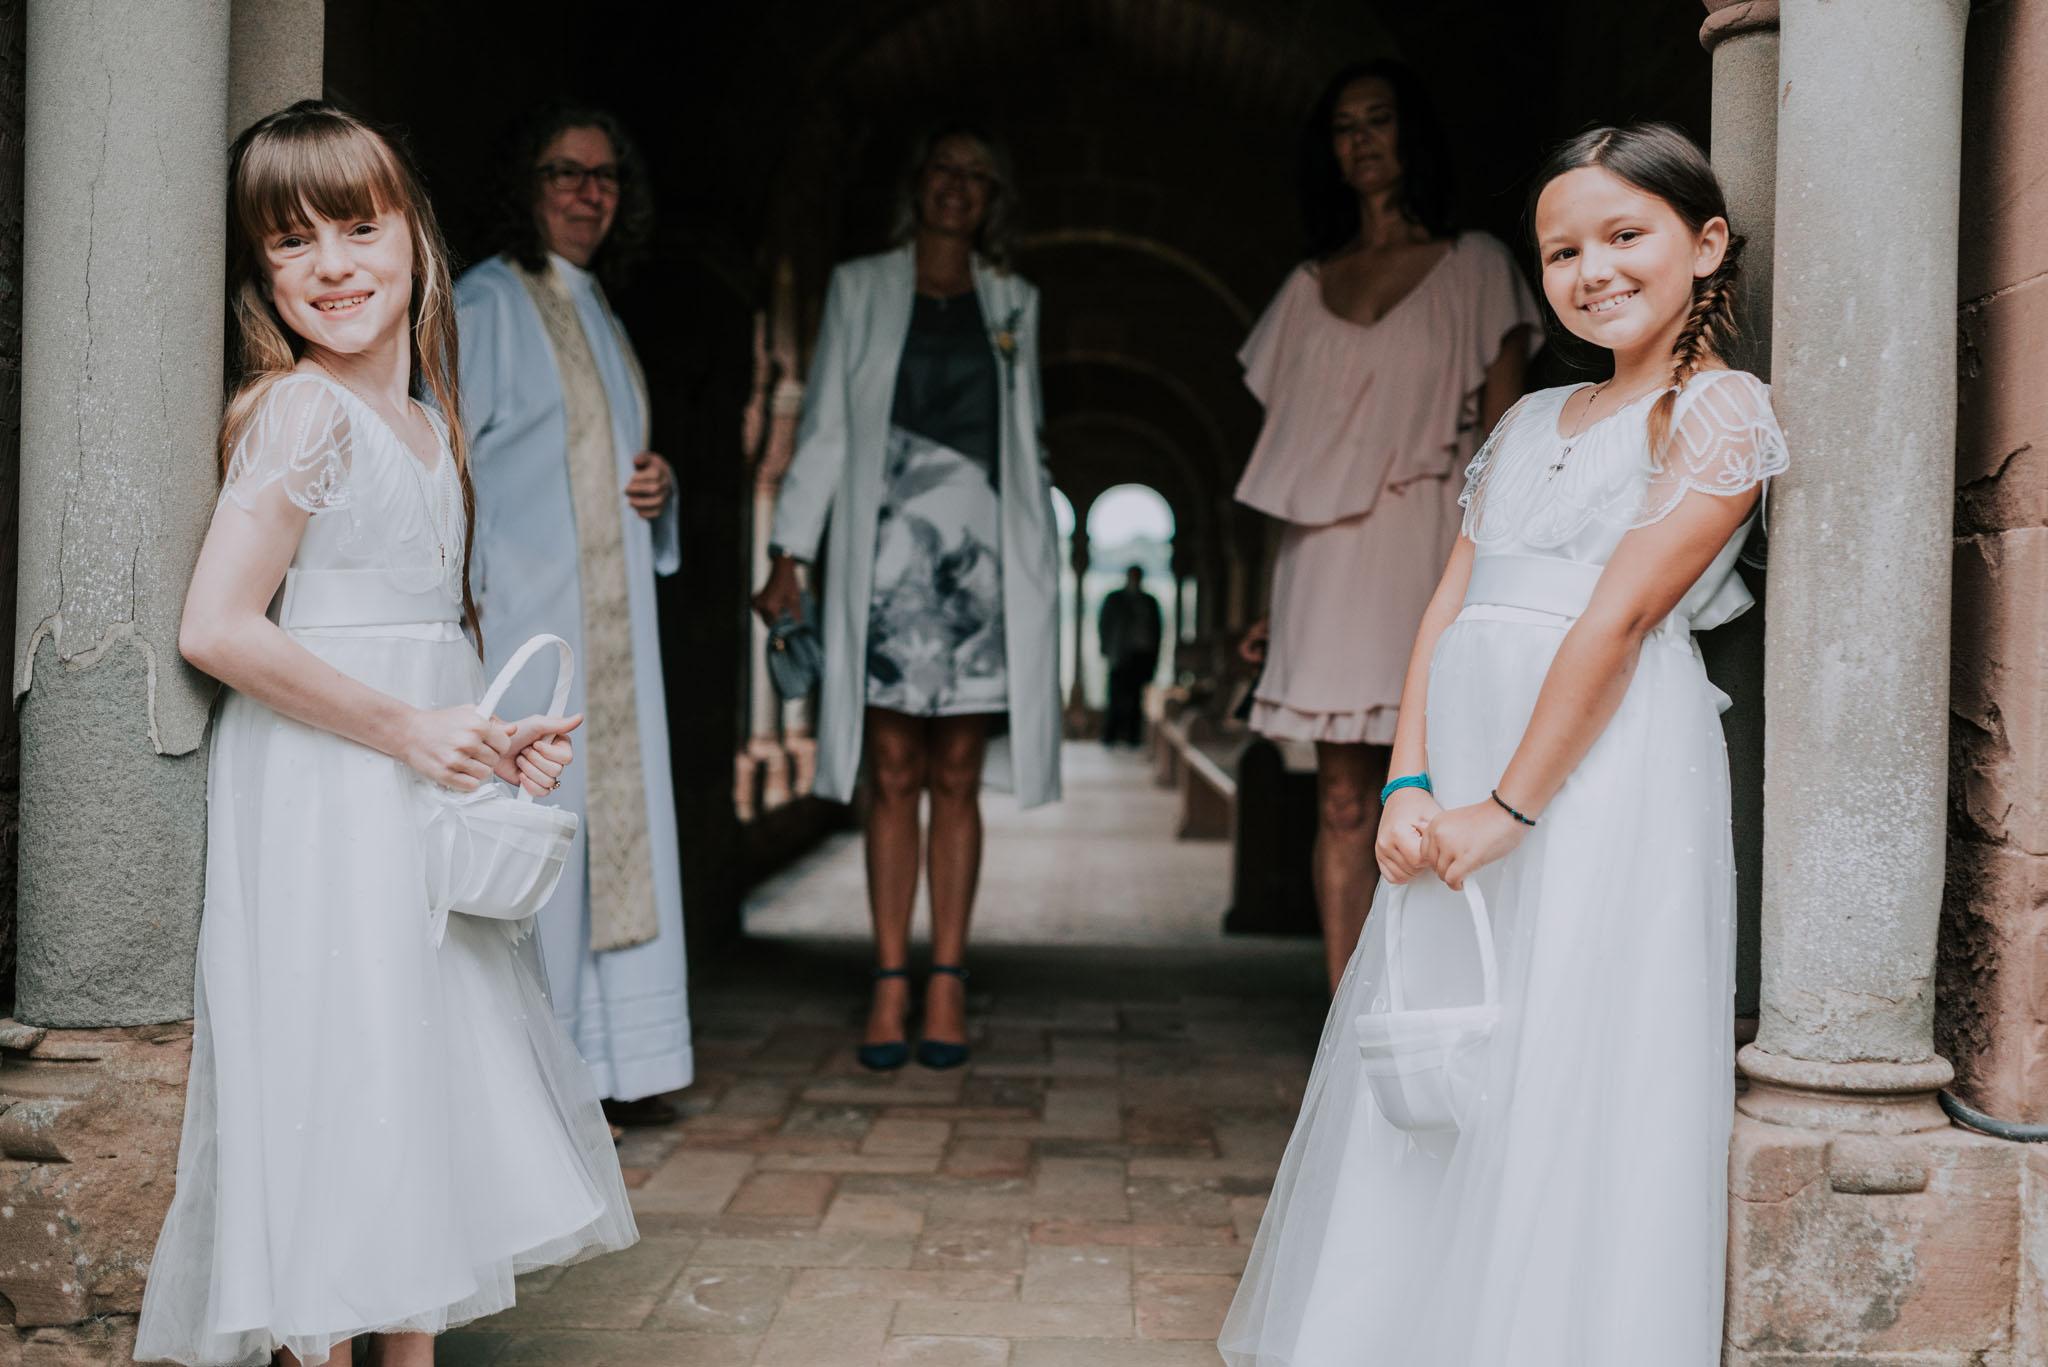 wedding-photographer-glewstone-court-hereford-scott-stockwell-photography144.jpg